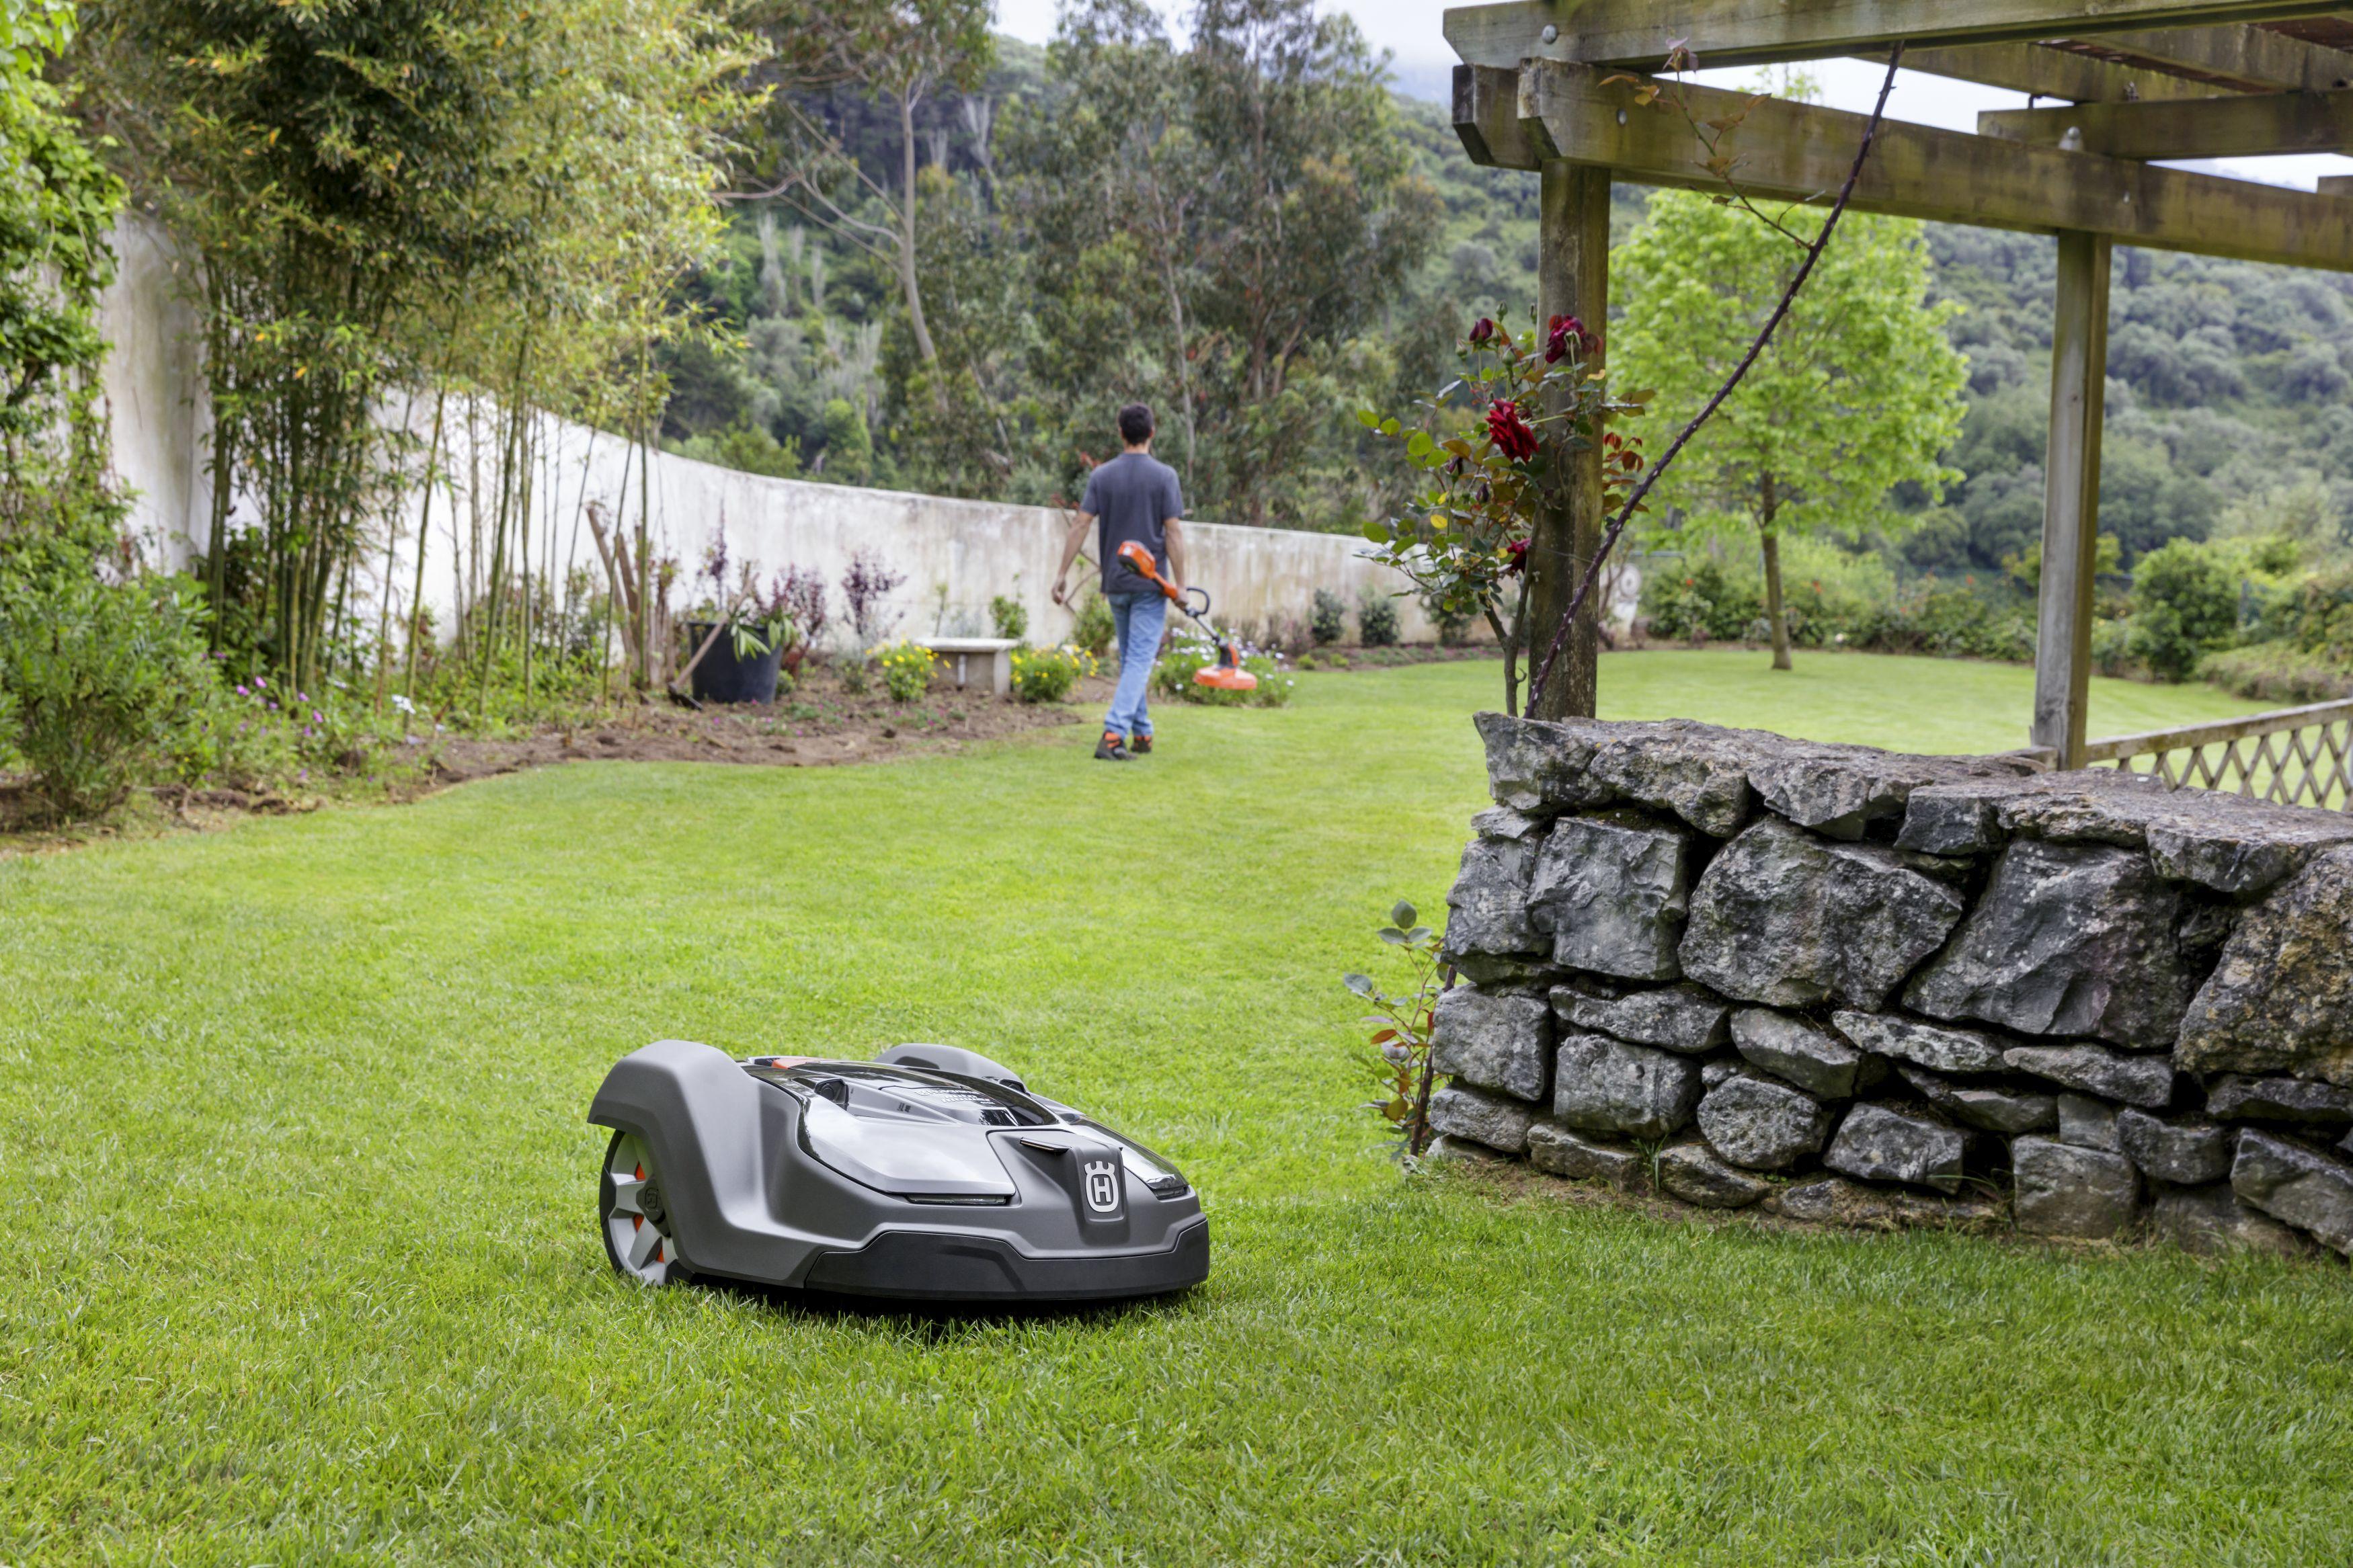 The Key Benefits of a High Tech Robotic Mower